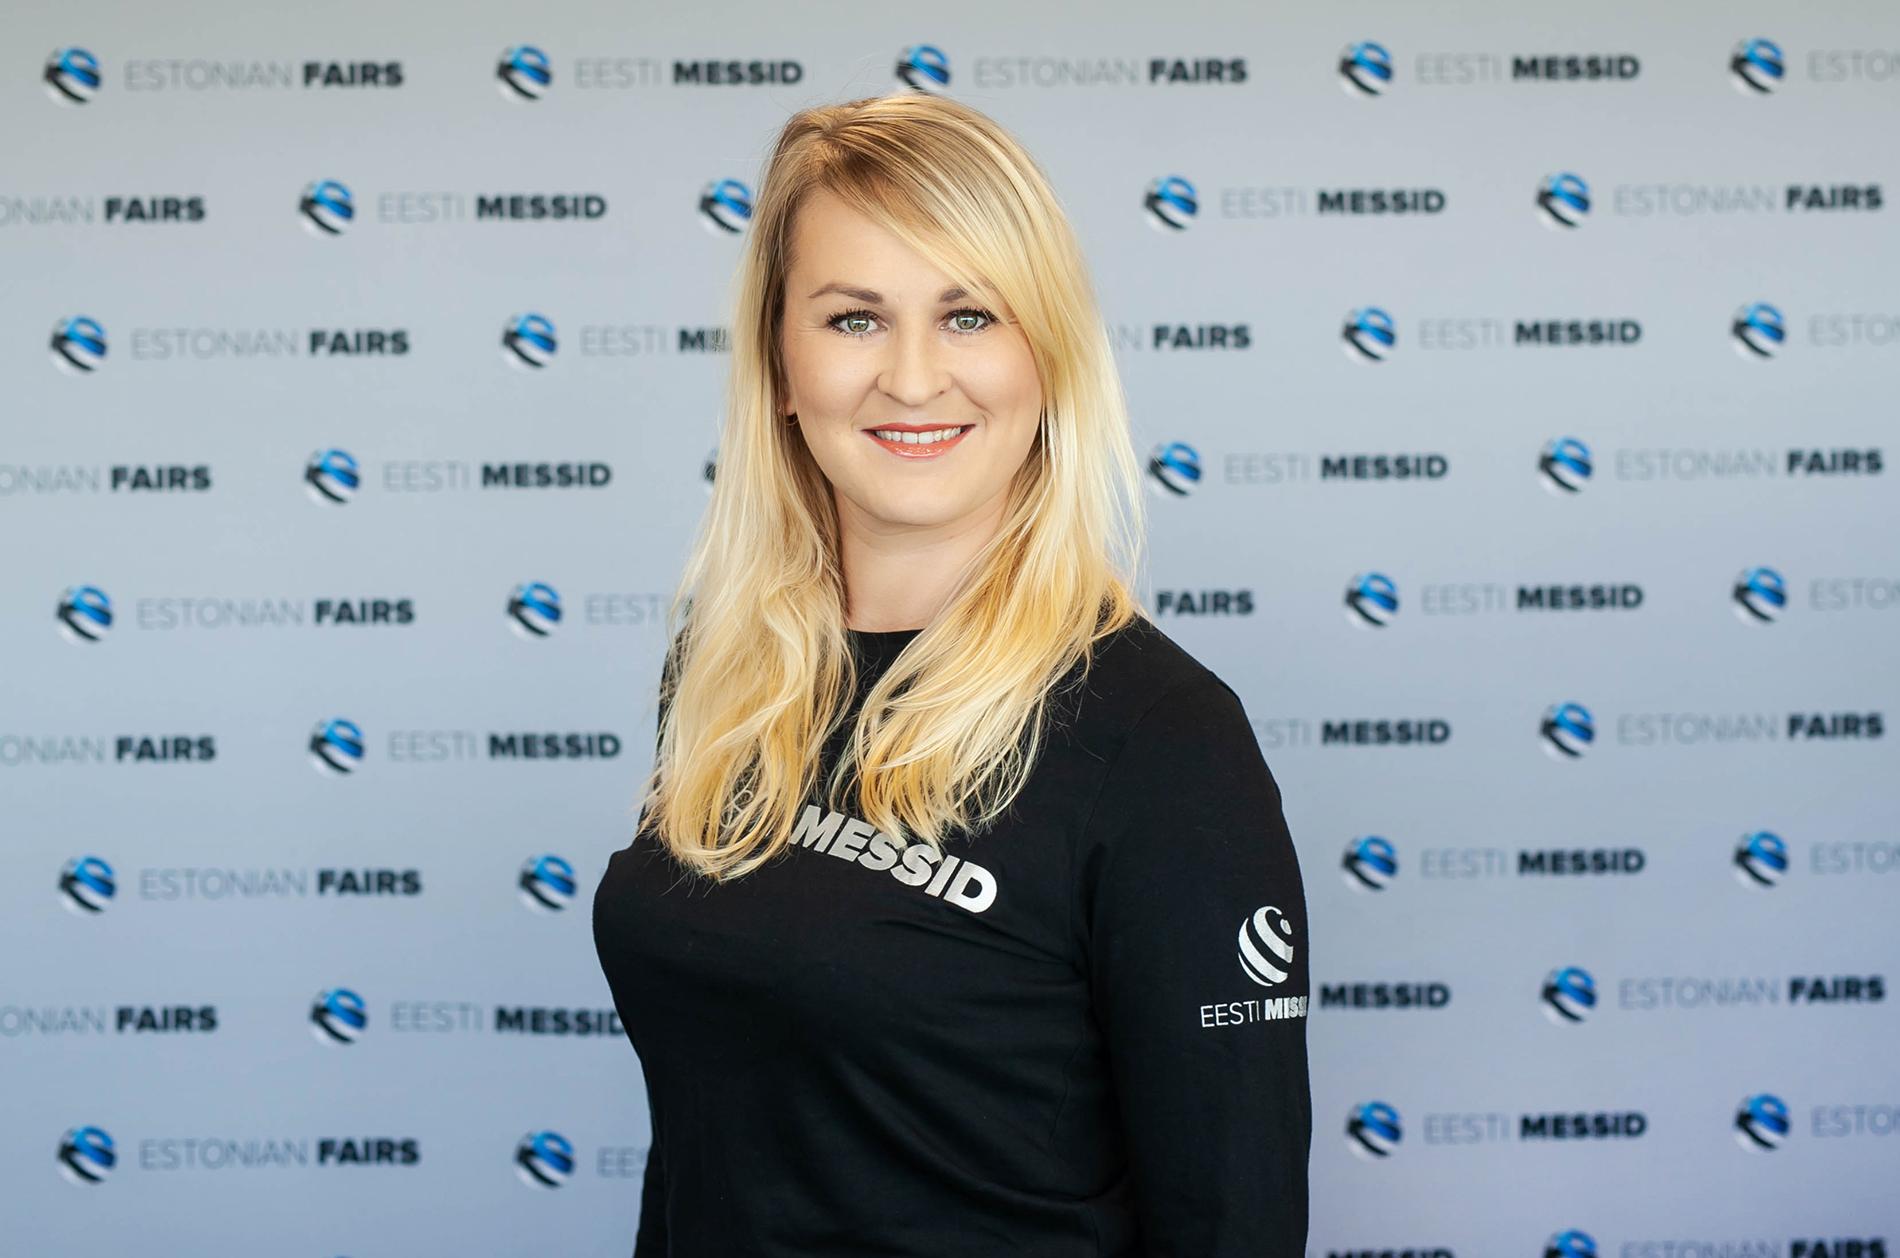 Lisette Vinter, toidumessi tegevjuht / CEO of the foodfair, +372 520 3274, toidumess@eestimessid.ee, www.toidumess.ee, www.kobarmess.ee